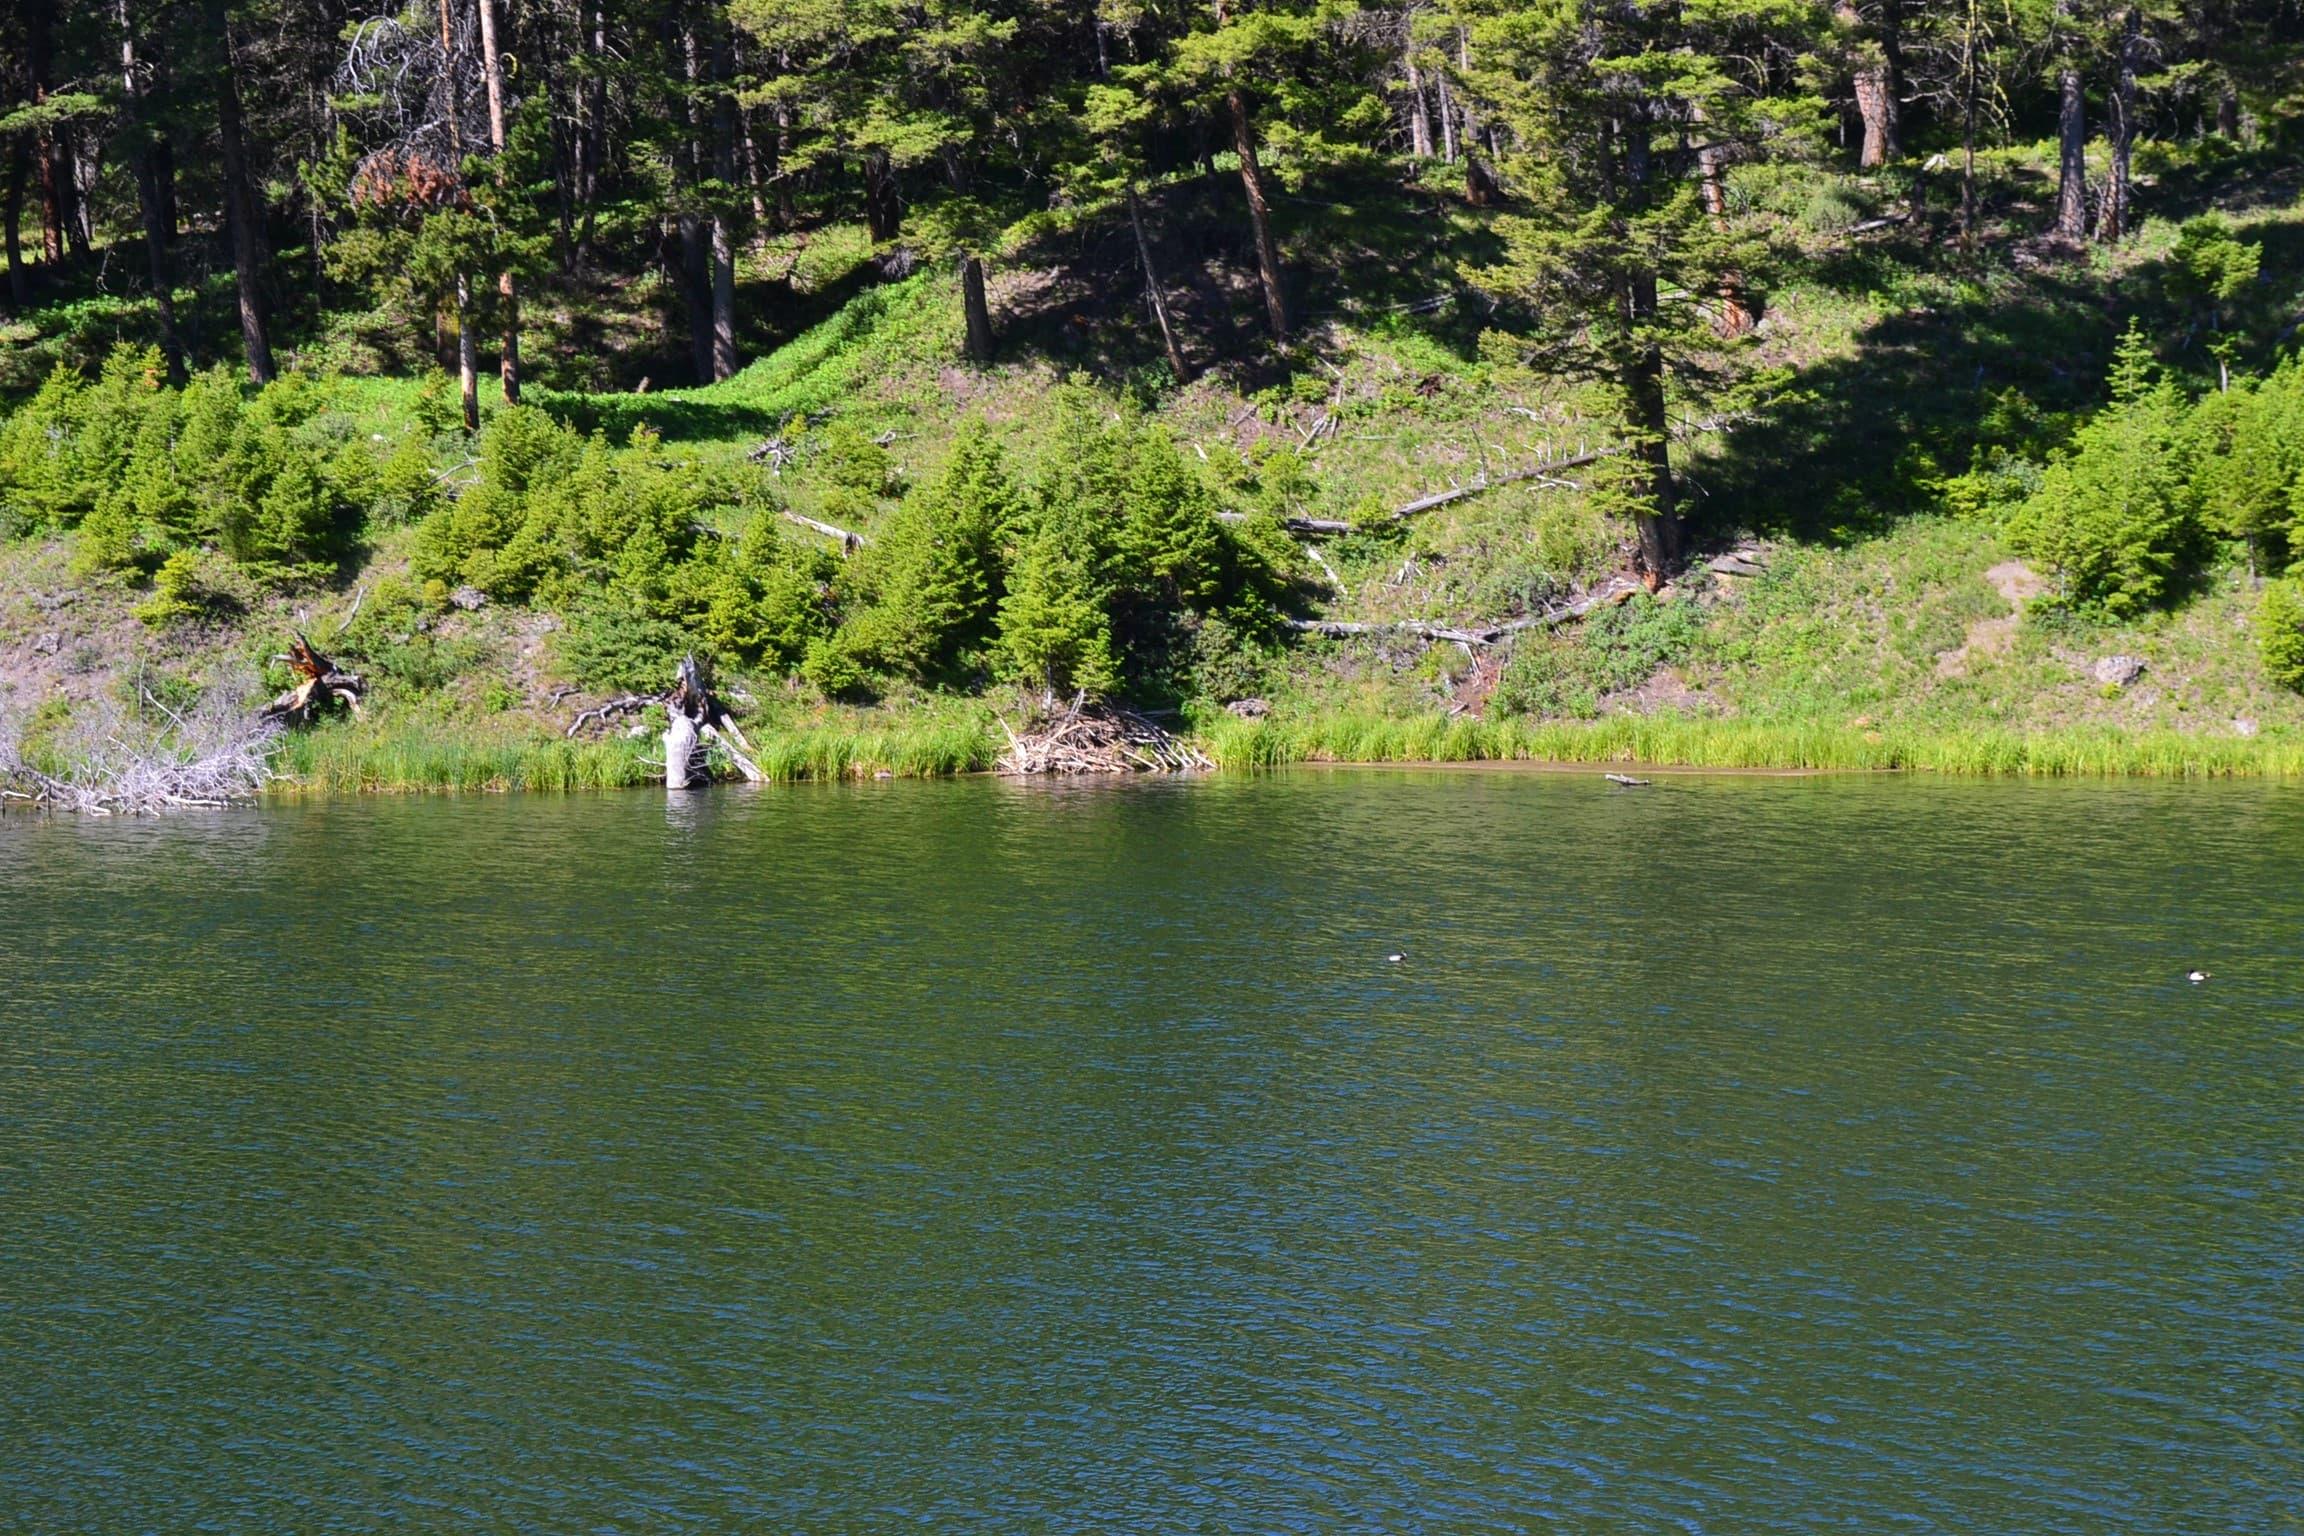 Beaver lodge on the pond's far shore.